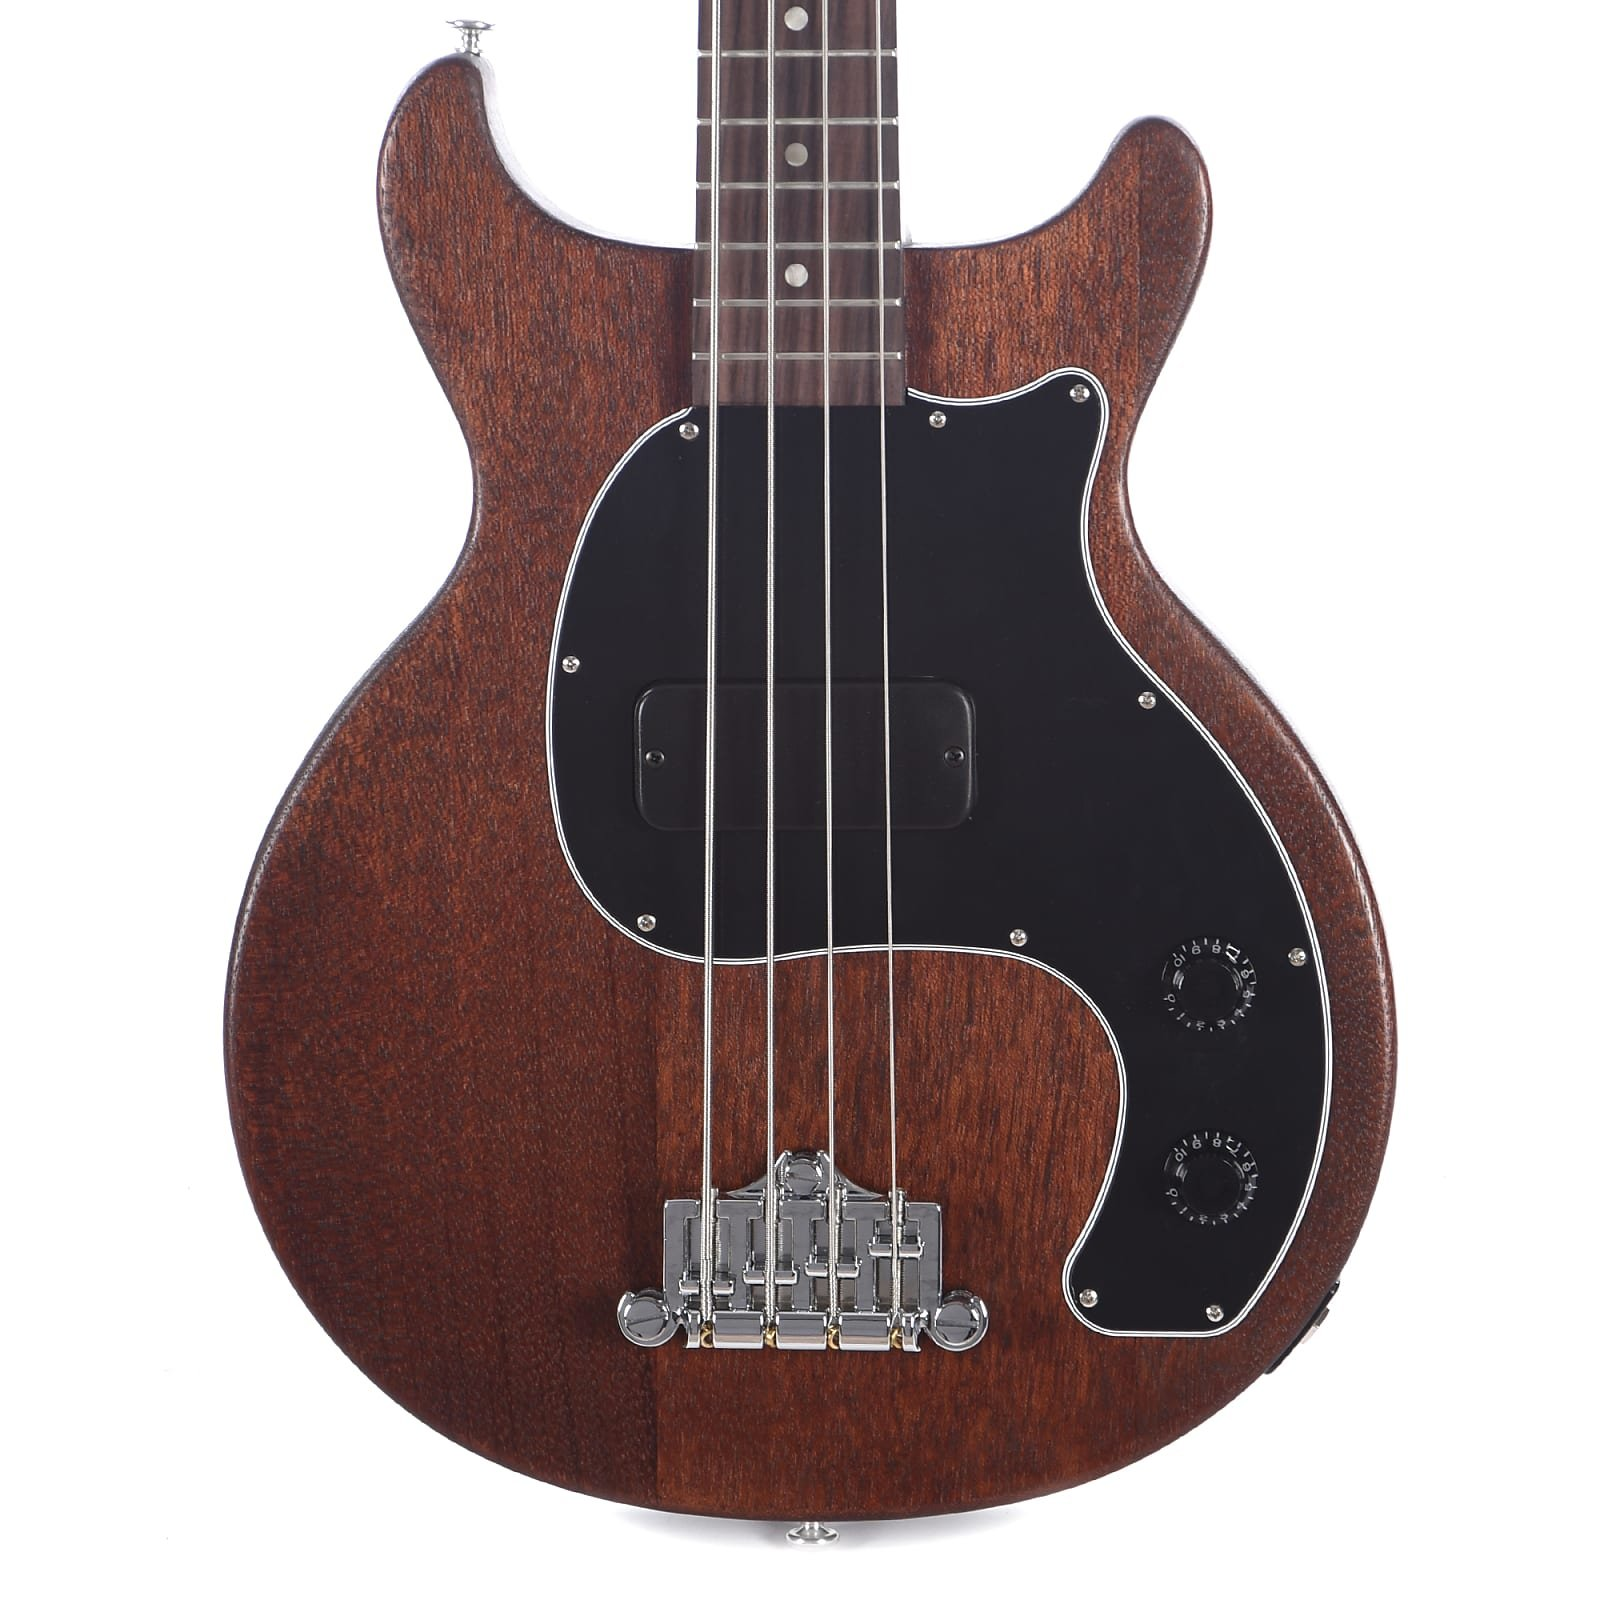 Gibson Les Paul Junior Tribute DC Bass - Worn Brown (DEMO)